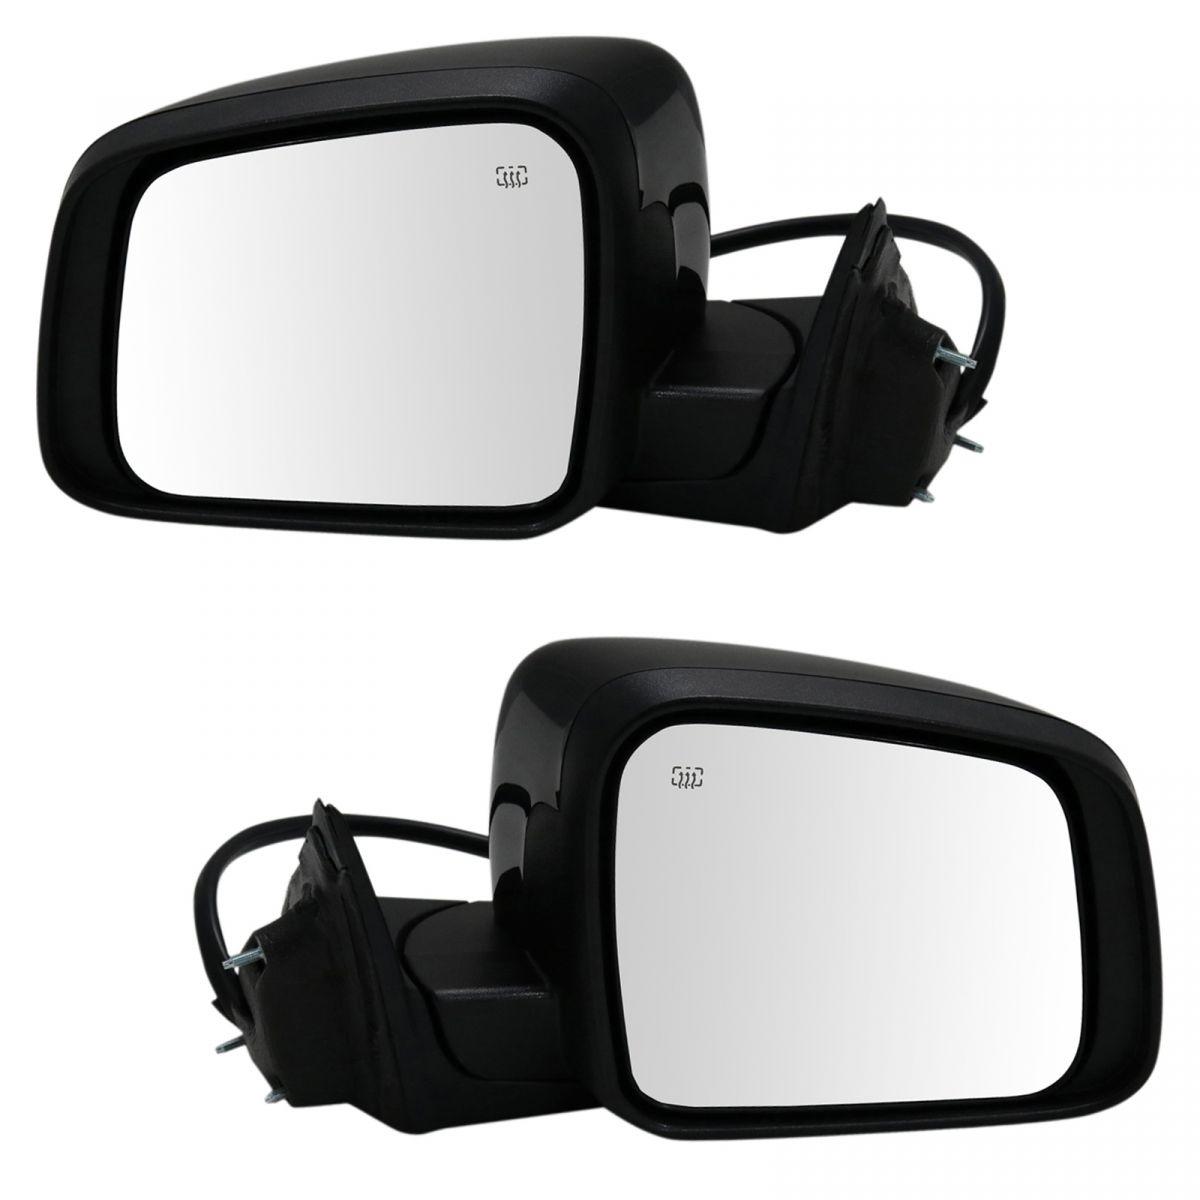 Mirror Power Heated Signal Memory Chrome Passenger Side for 11-13 Grand Cherokee